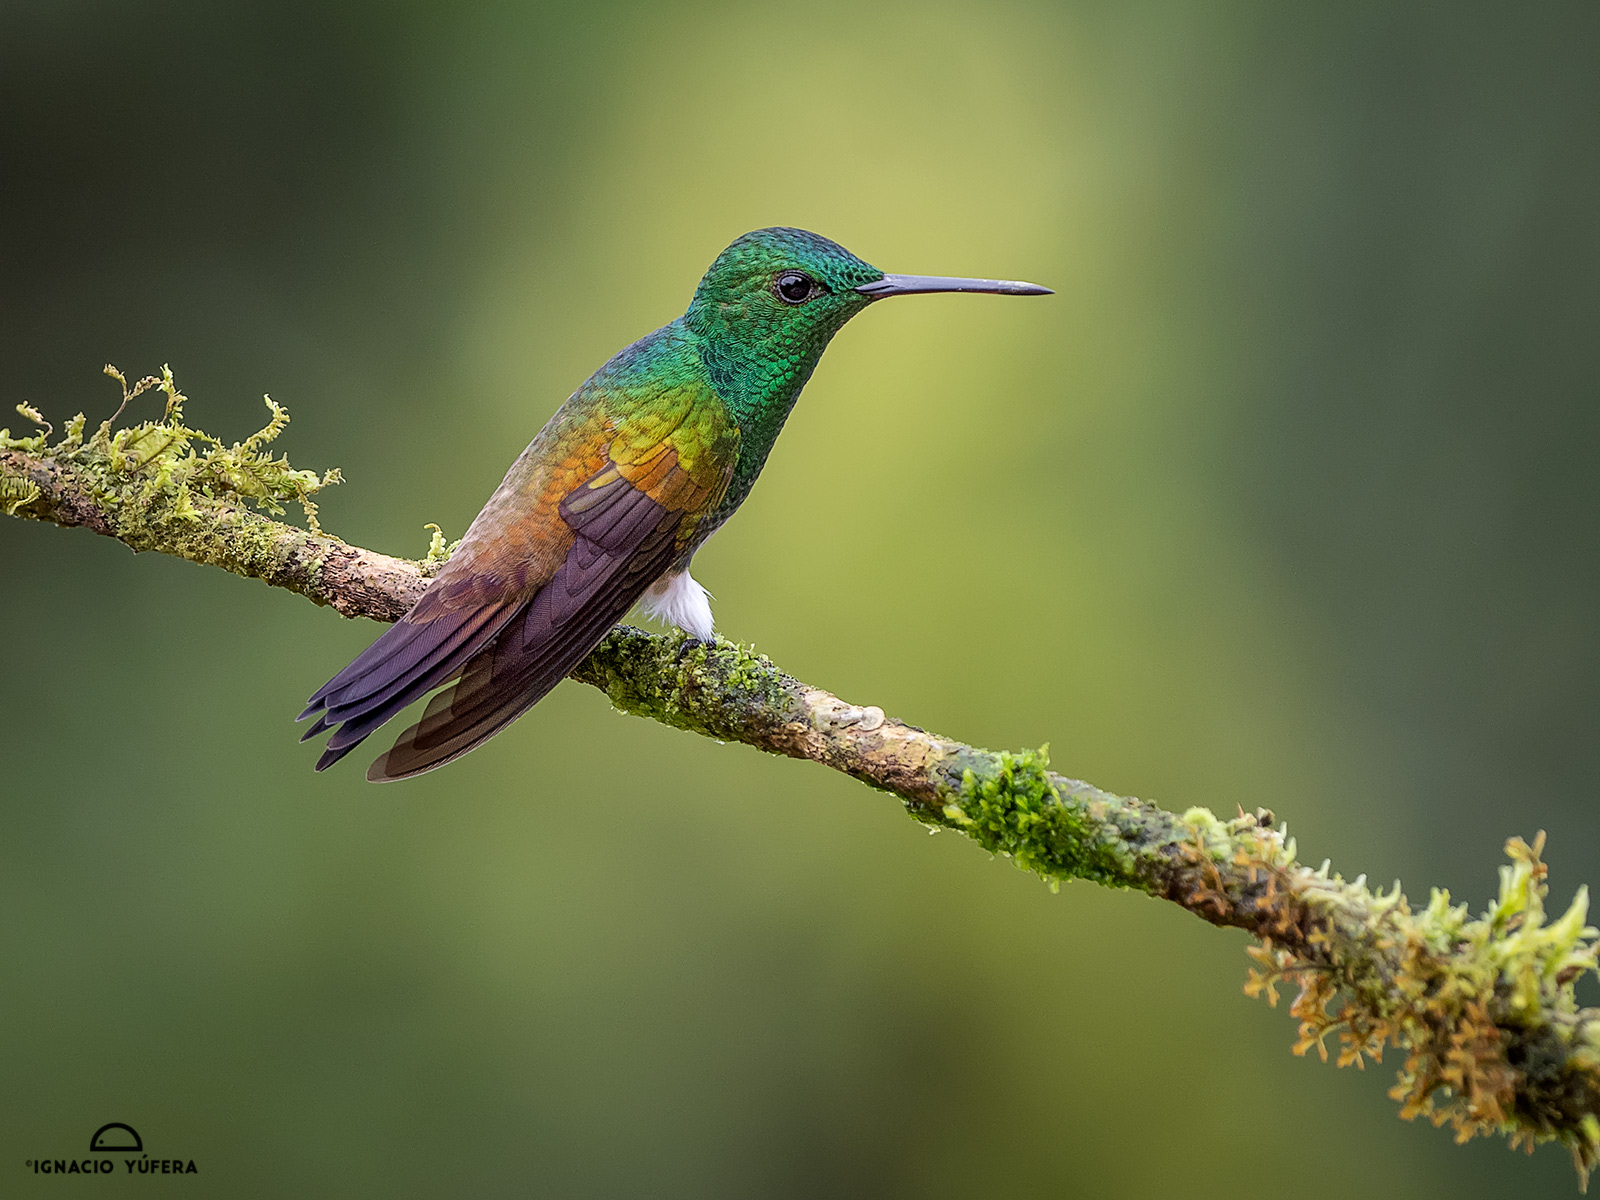 Snowy-bellied hummingbird (Amazilia edward), male, Panama, July